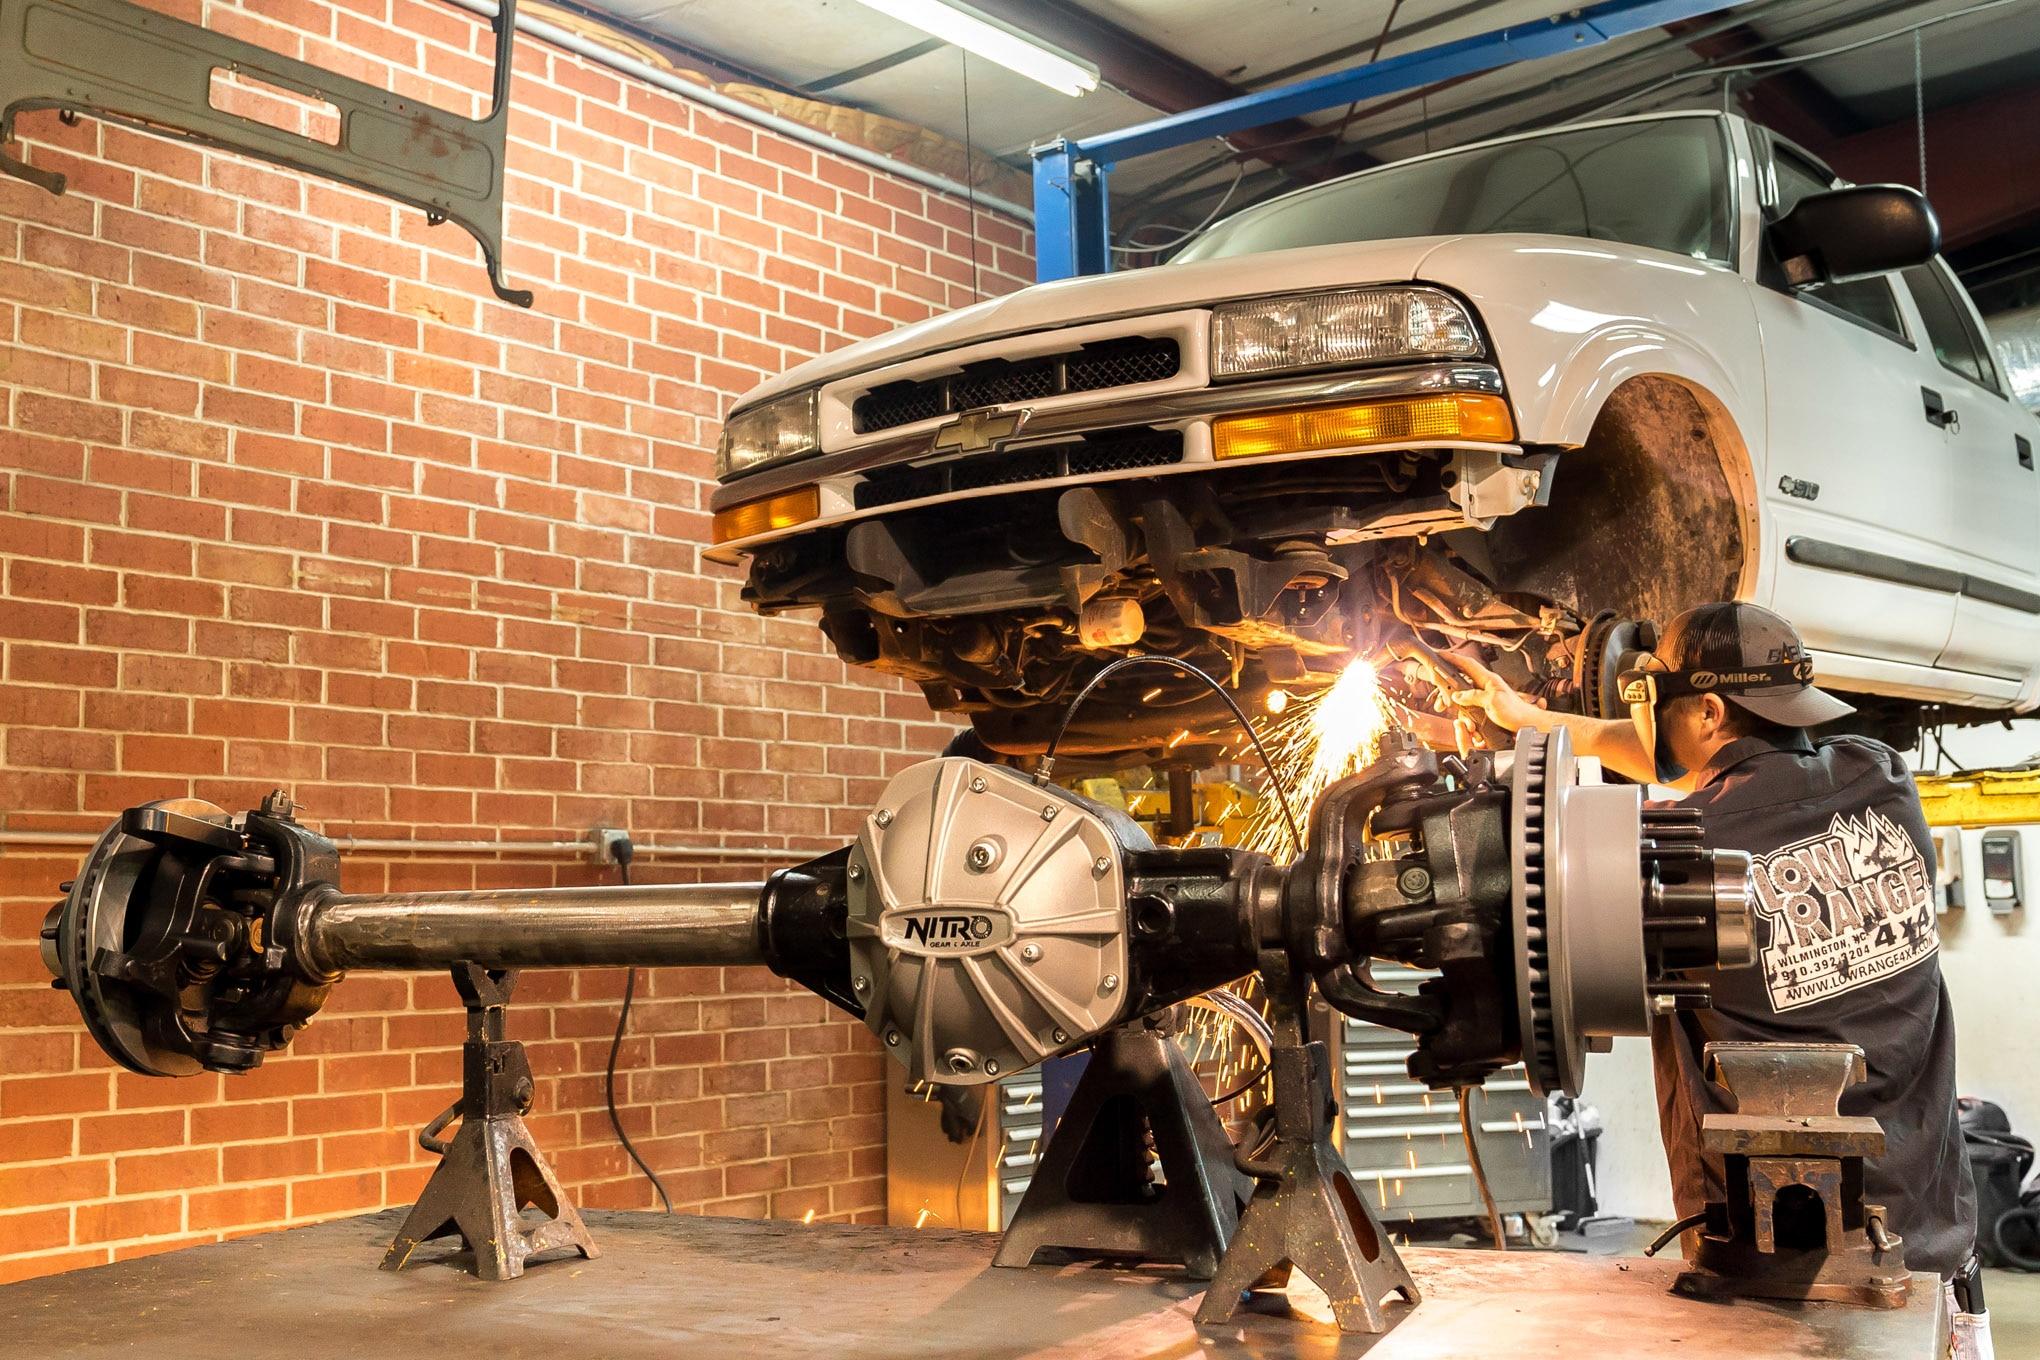 1 ton axle swap dana 60 14 bolt ARB Nitro Gear S 10 sas lead